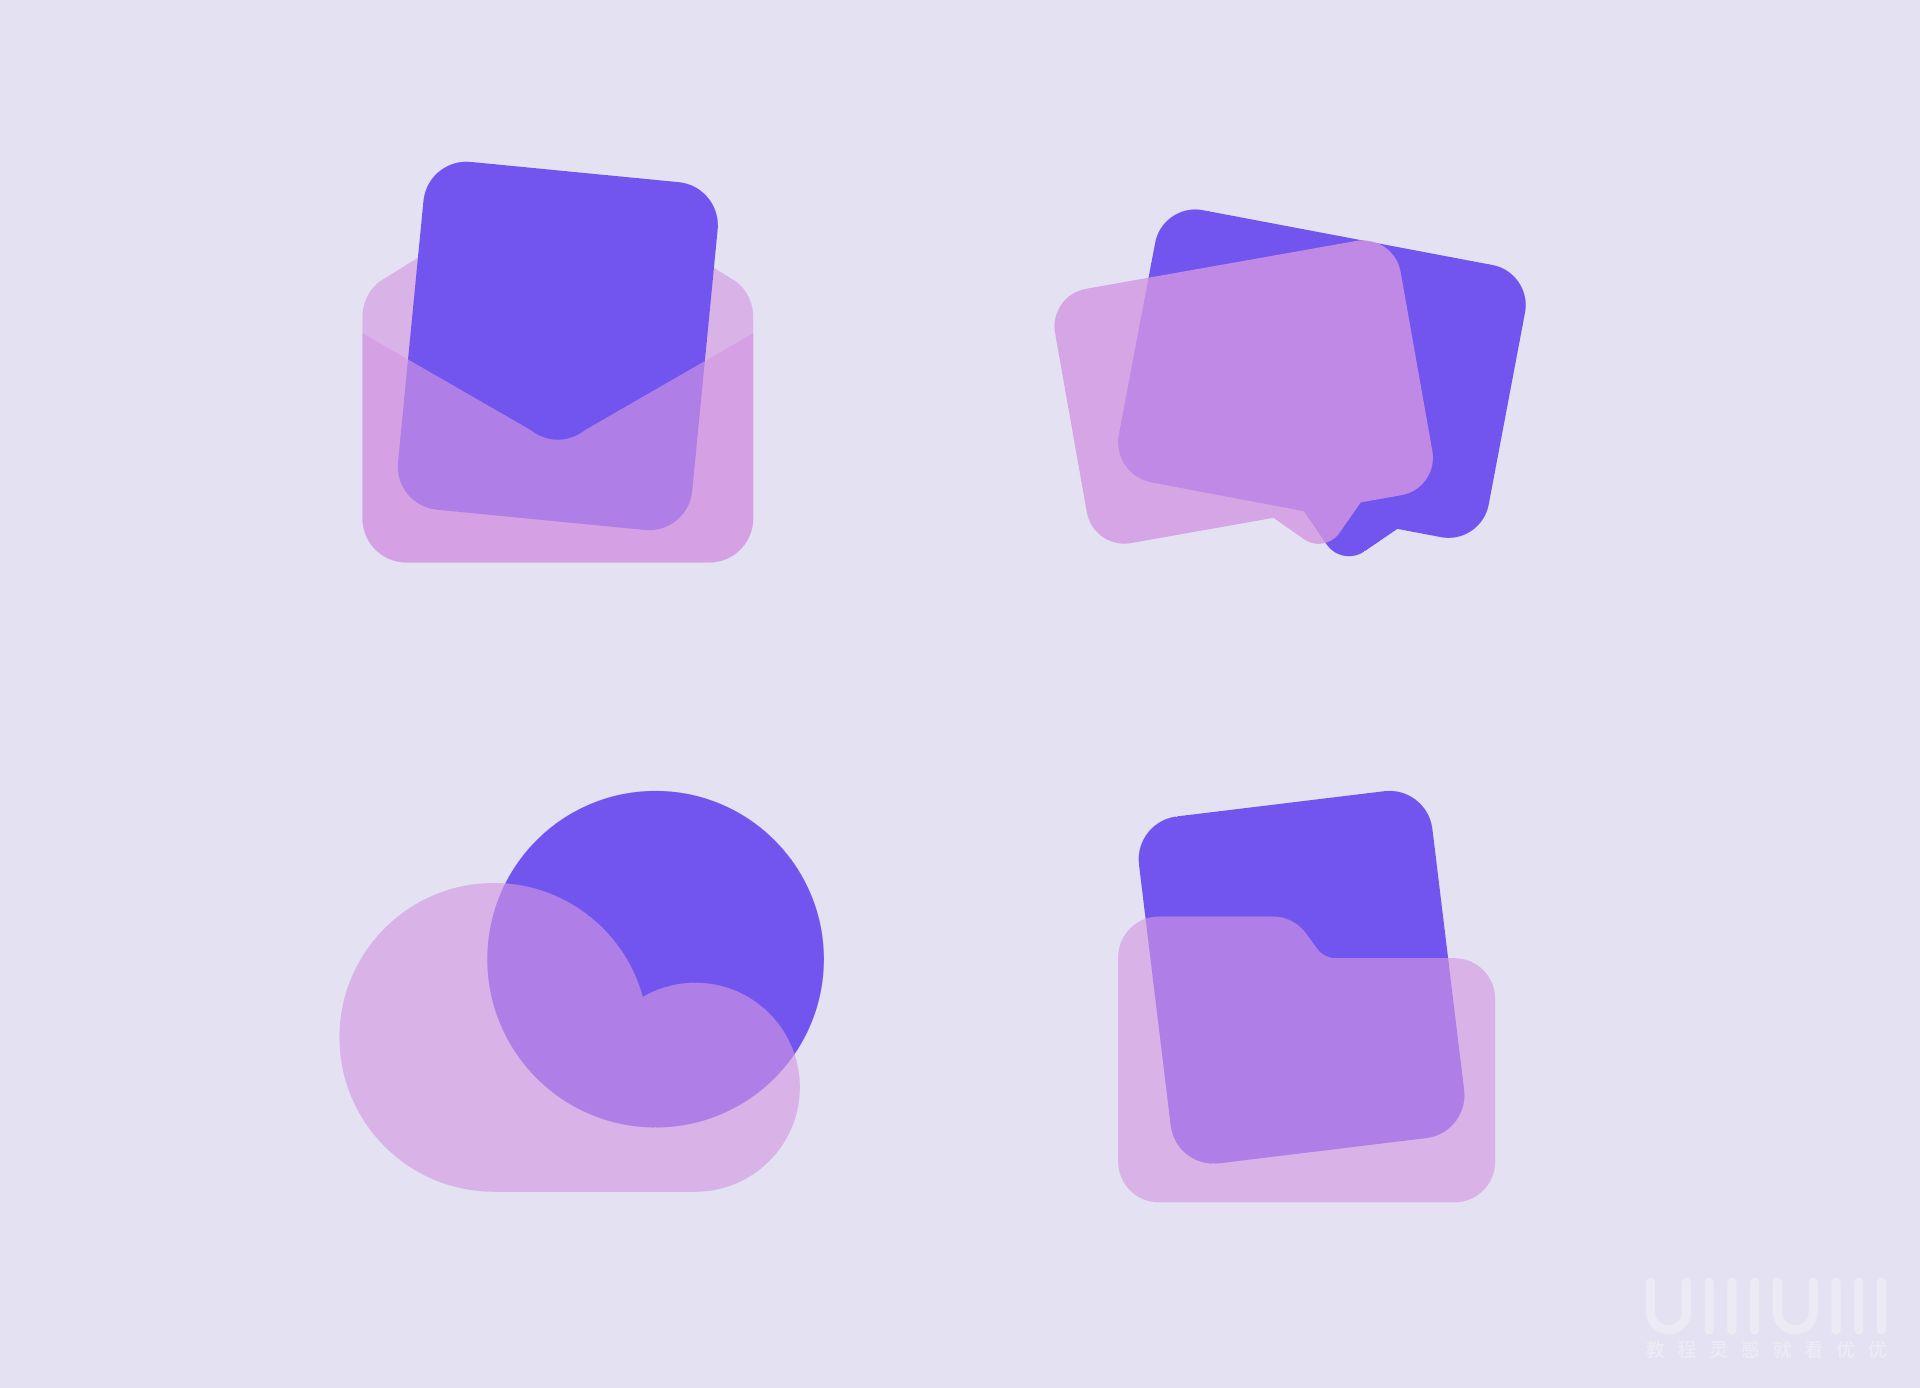 1621483844-83b39c633b8e575